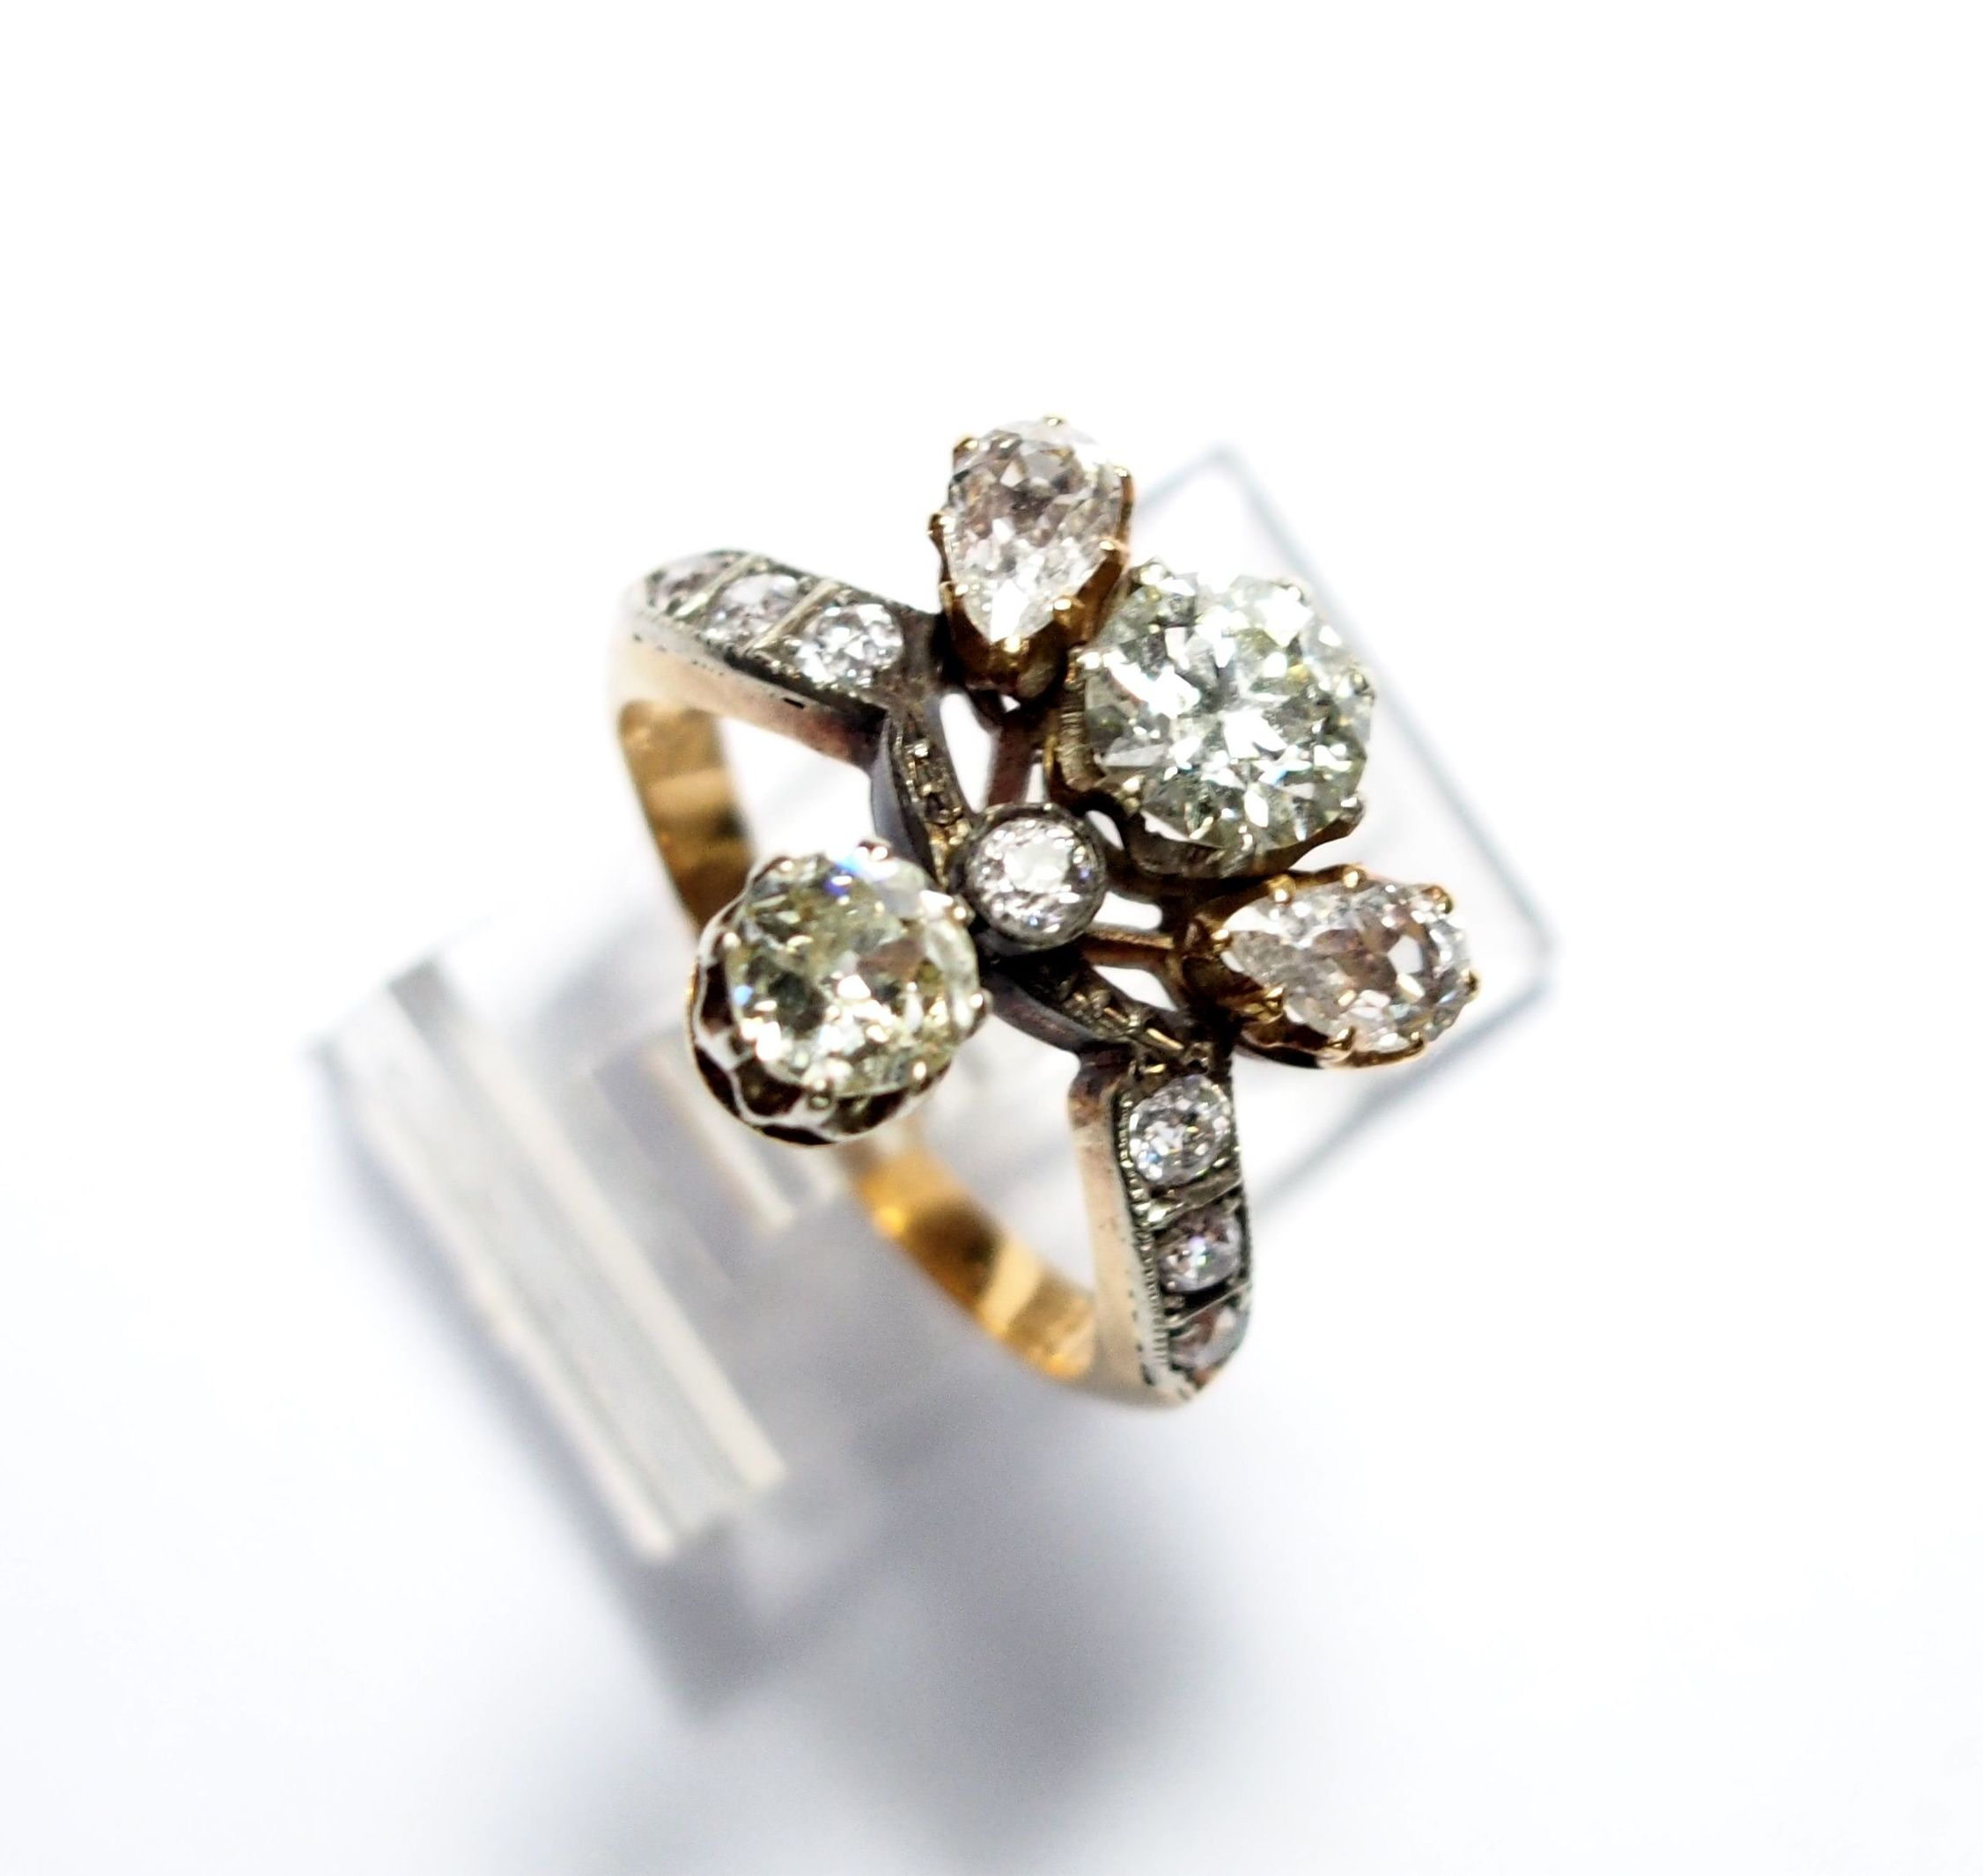 Sortija de oro de 18k con diamantes y diversas tallas. Circa: 1910-1920: Catálogo de Antigua Joyeros